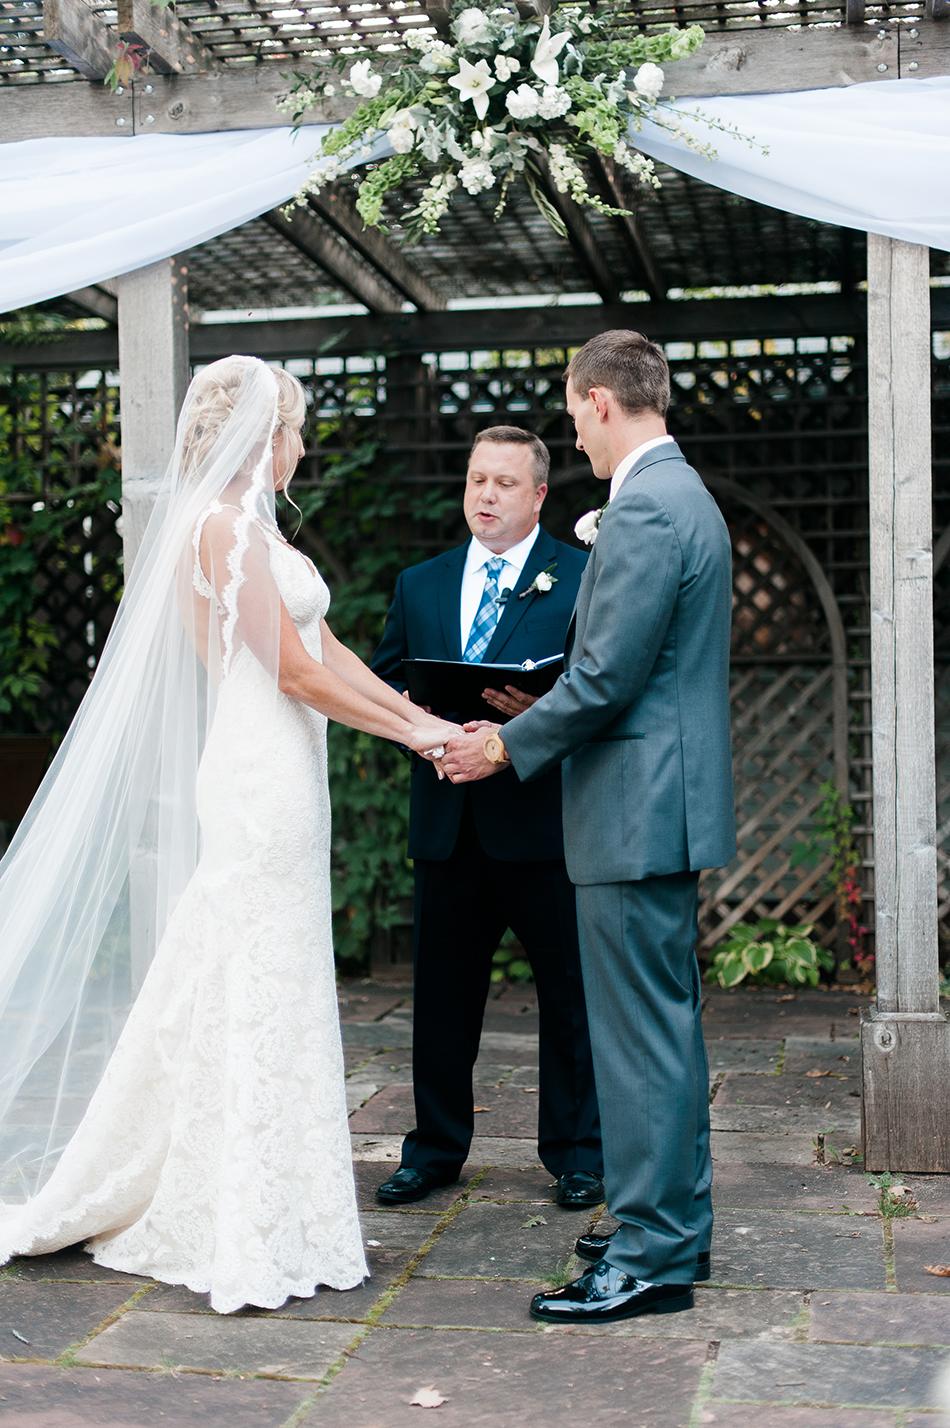 minnesota-realwedding-10.jpg